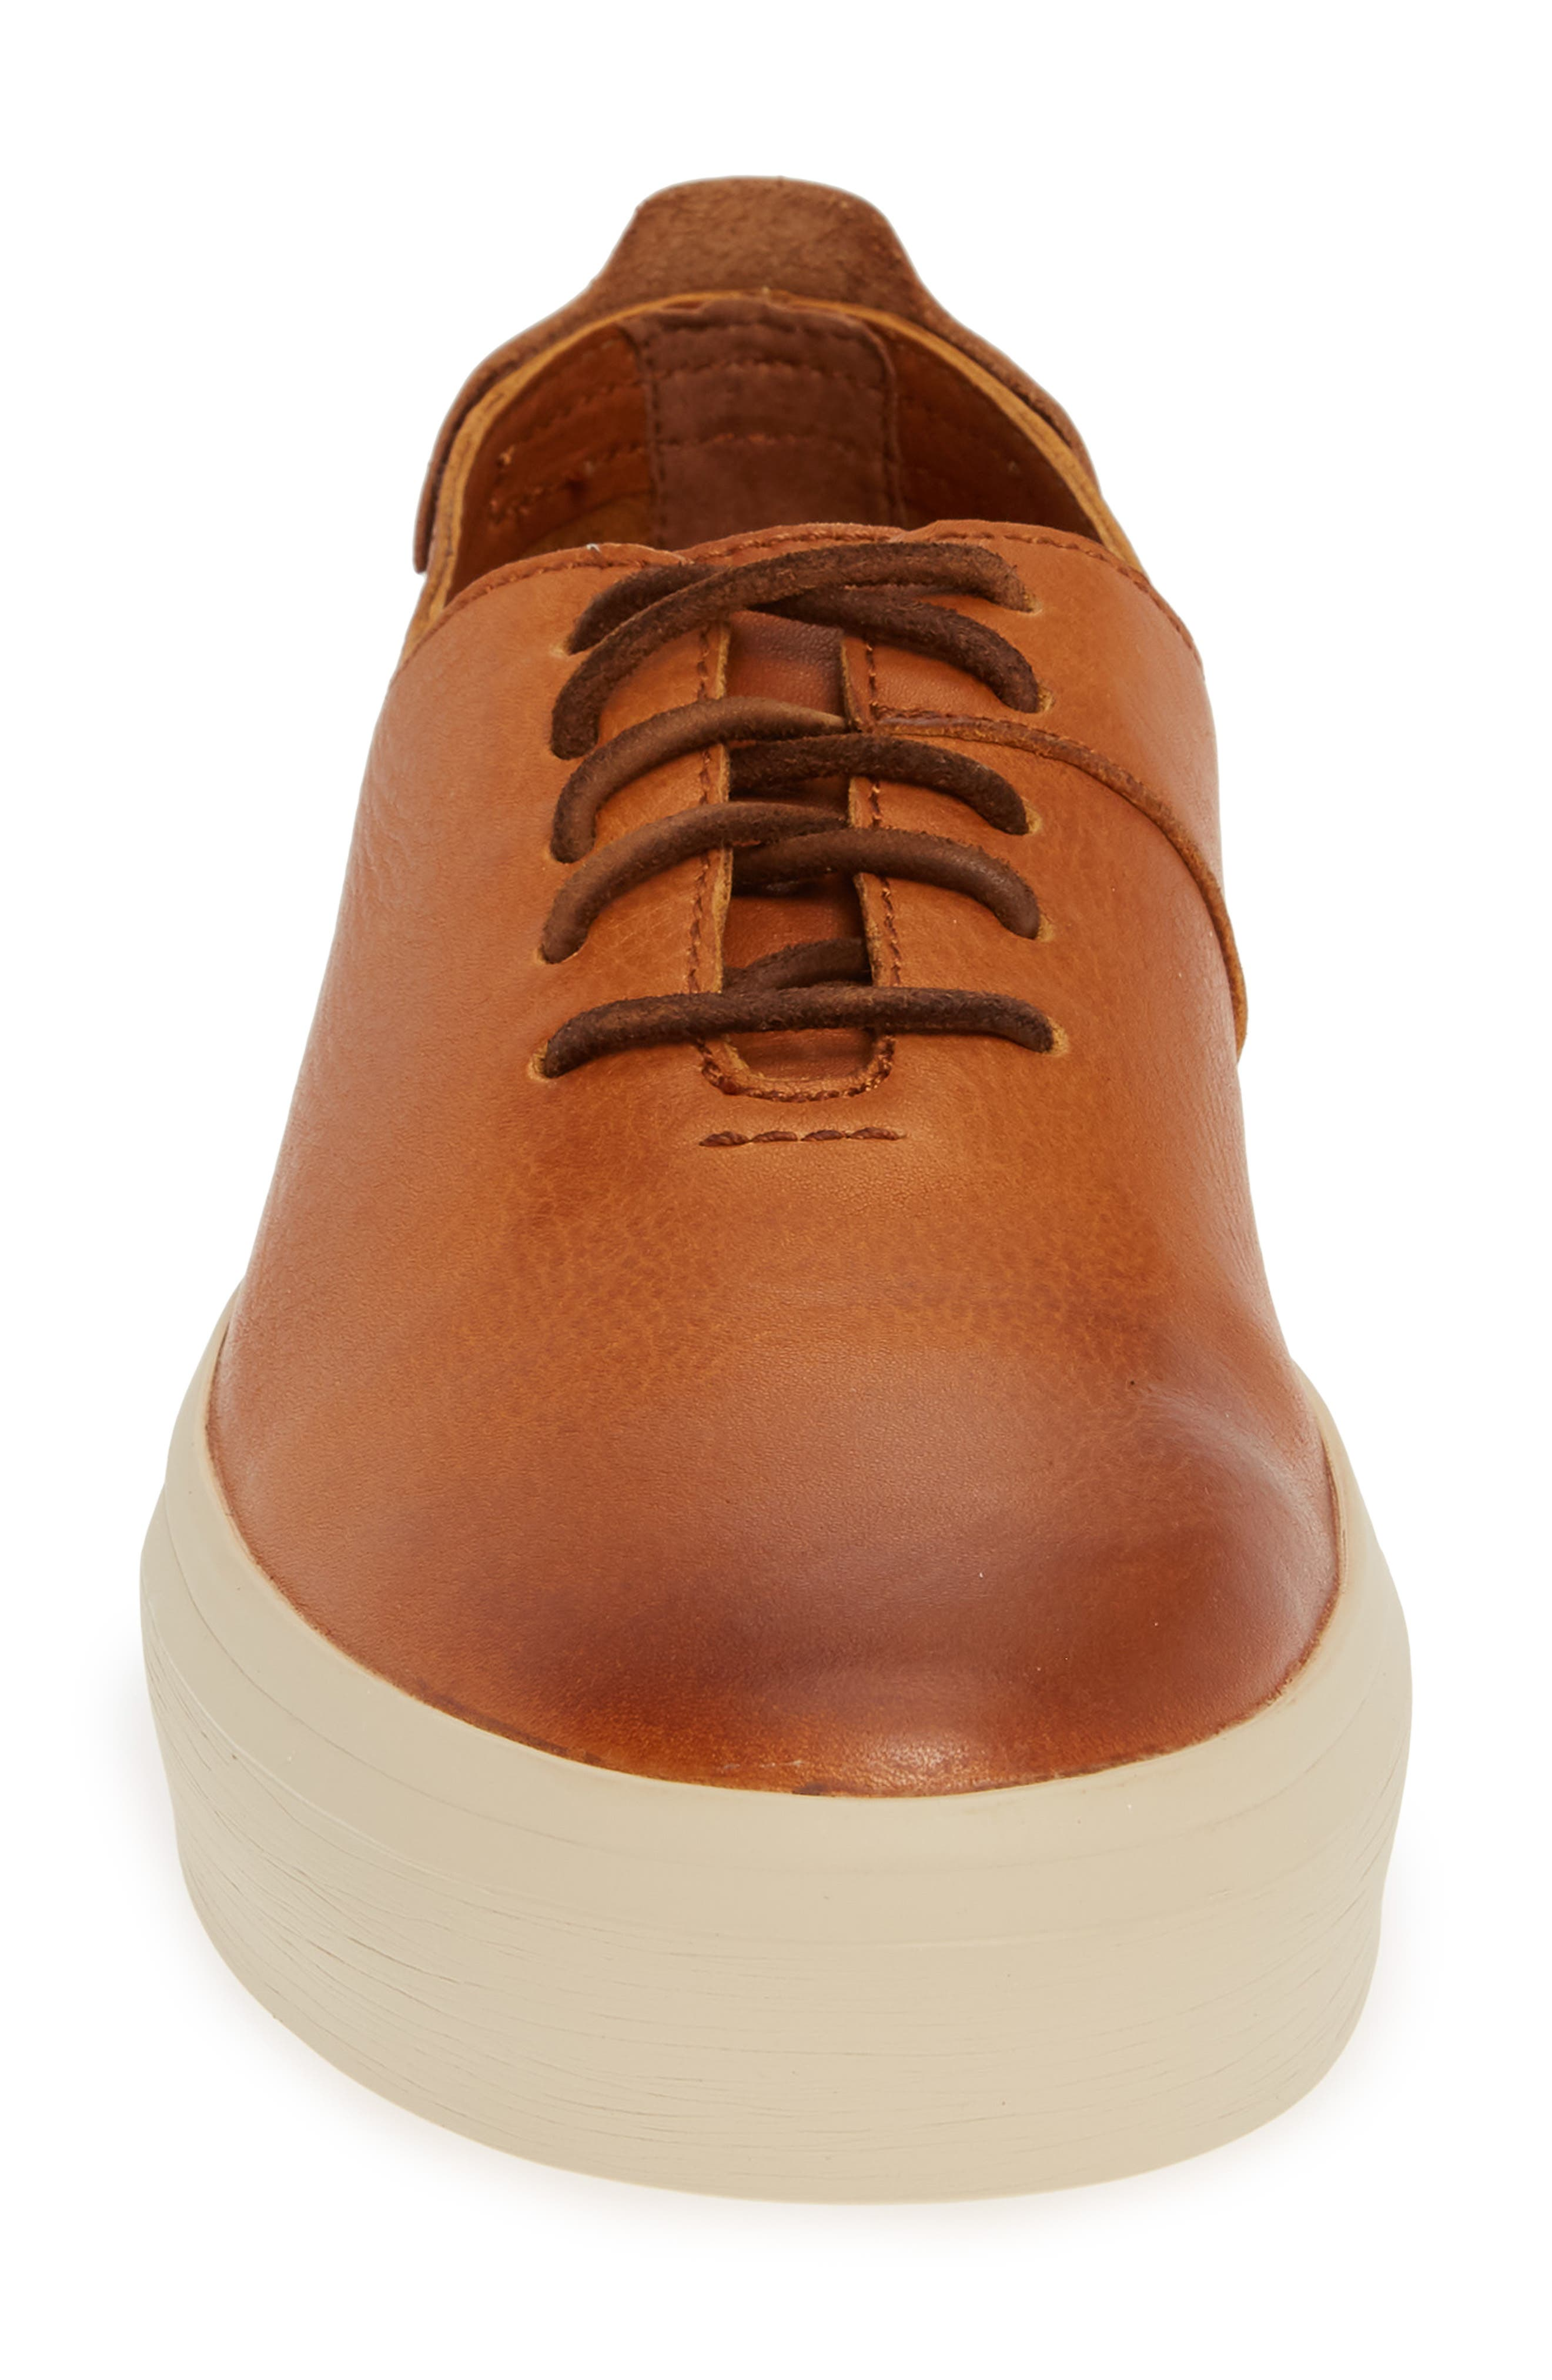 FRYE,                             Beacon Sneaker,                             Alternate thumbnail 4, color,                             CARAMEL LEATHER